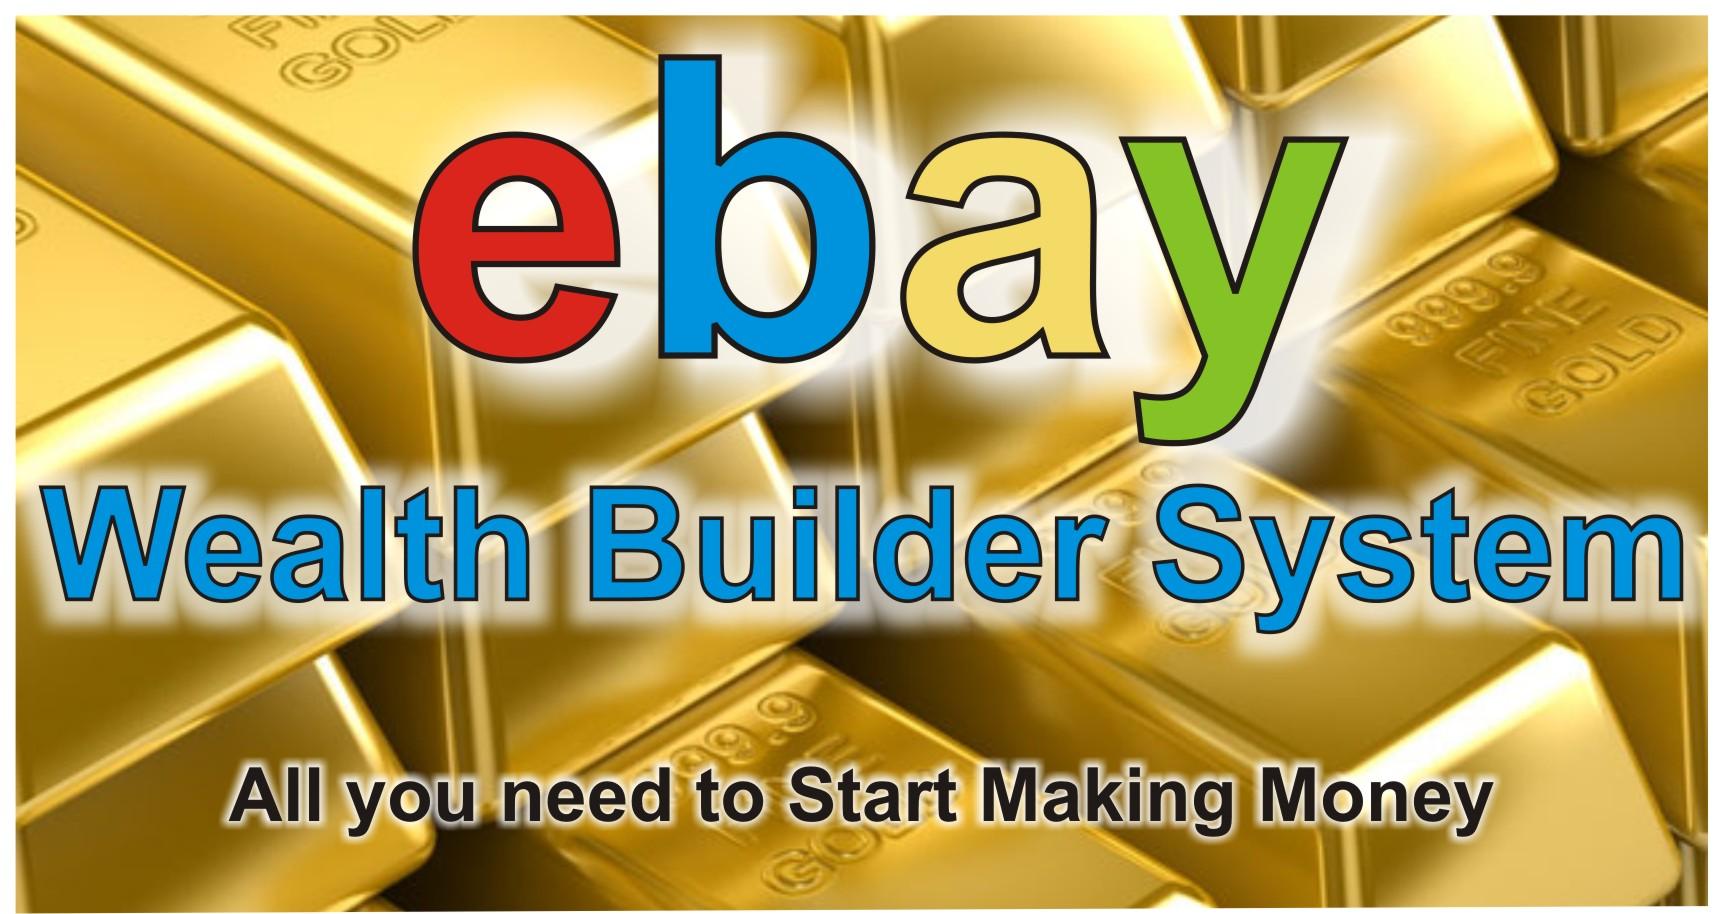 Index Of AuctionImages100k Ebay Business